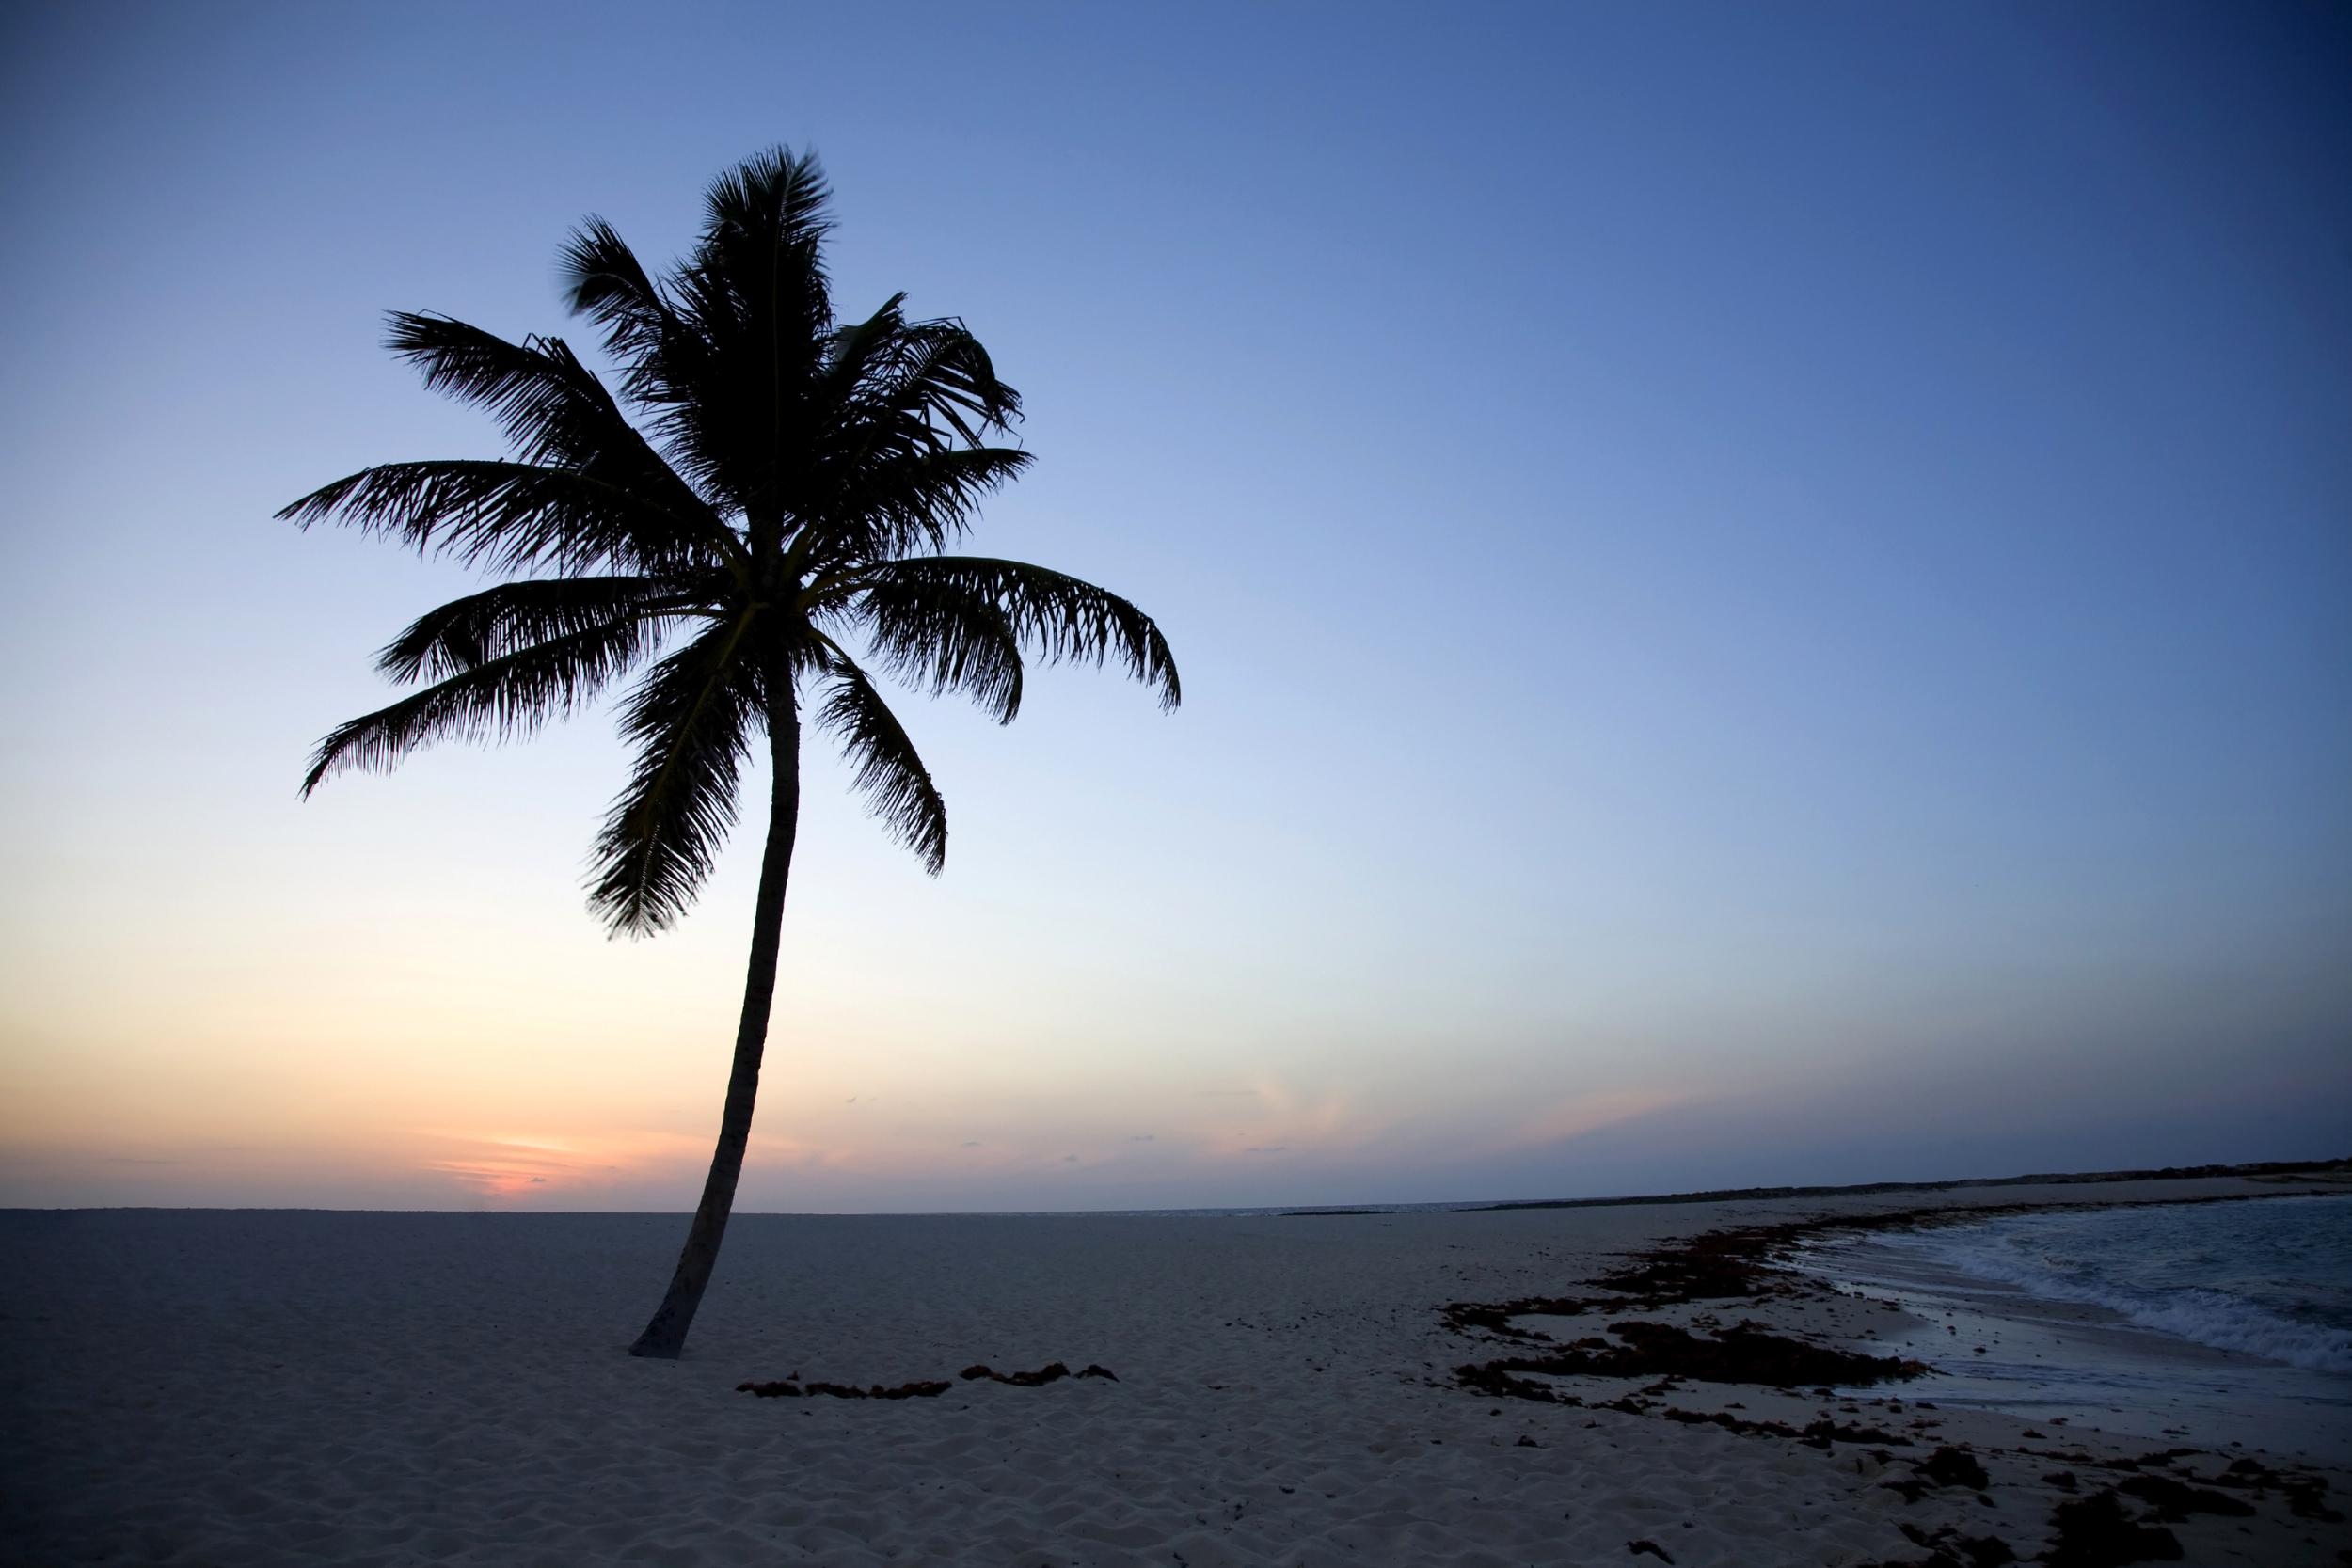 single palm tree productions